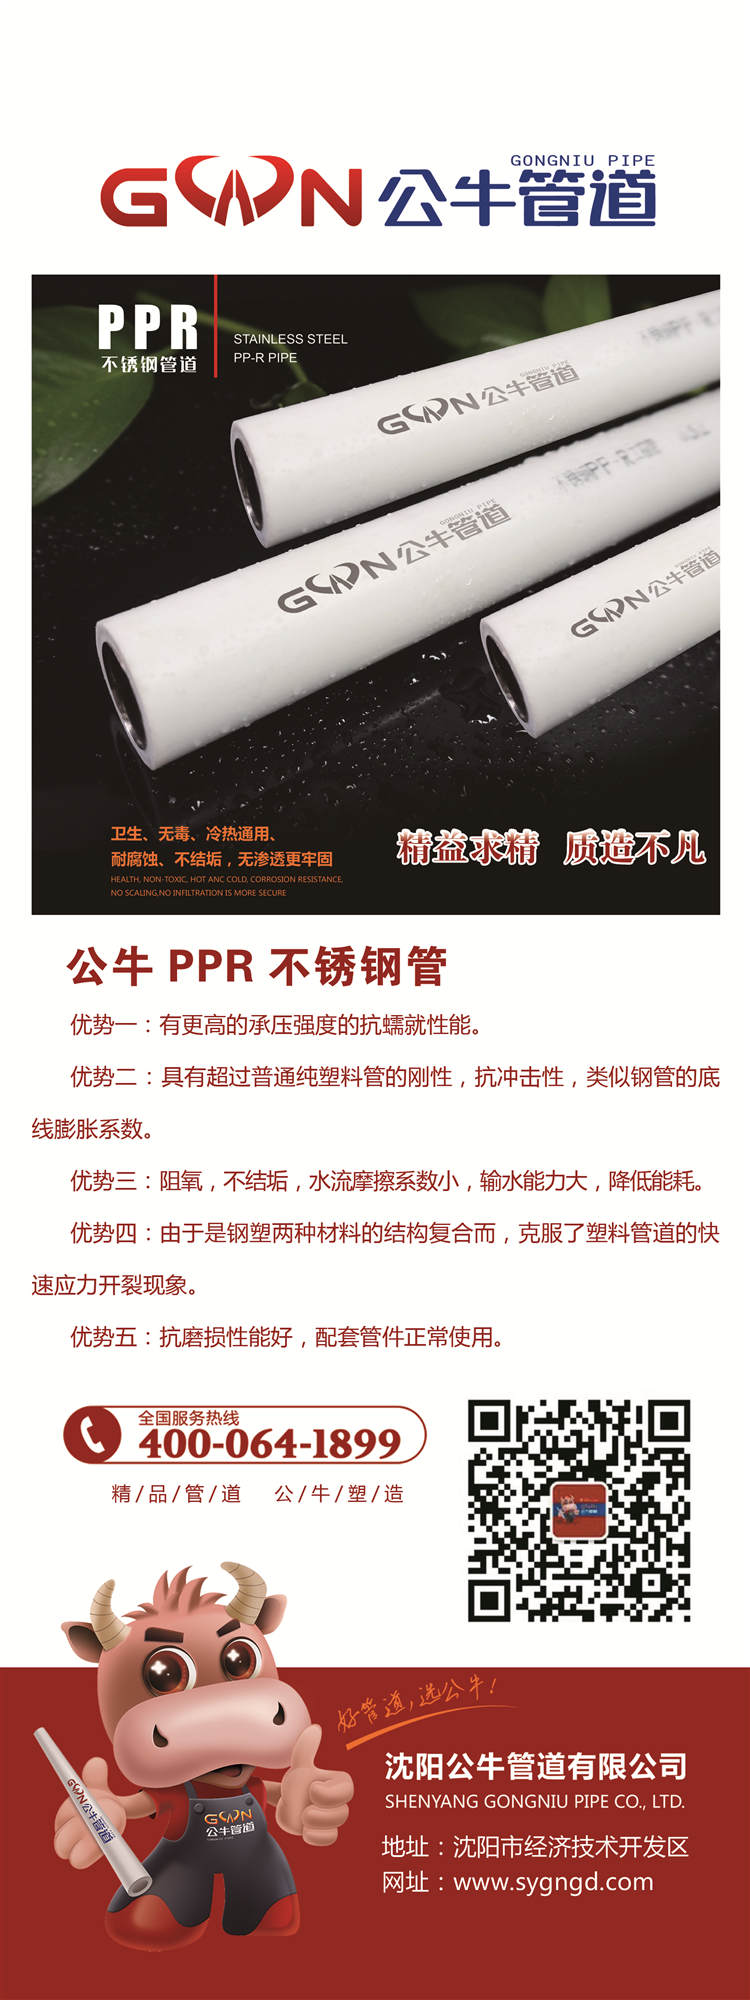 PPR不锈钢管_副本.jpg